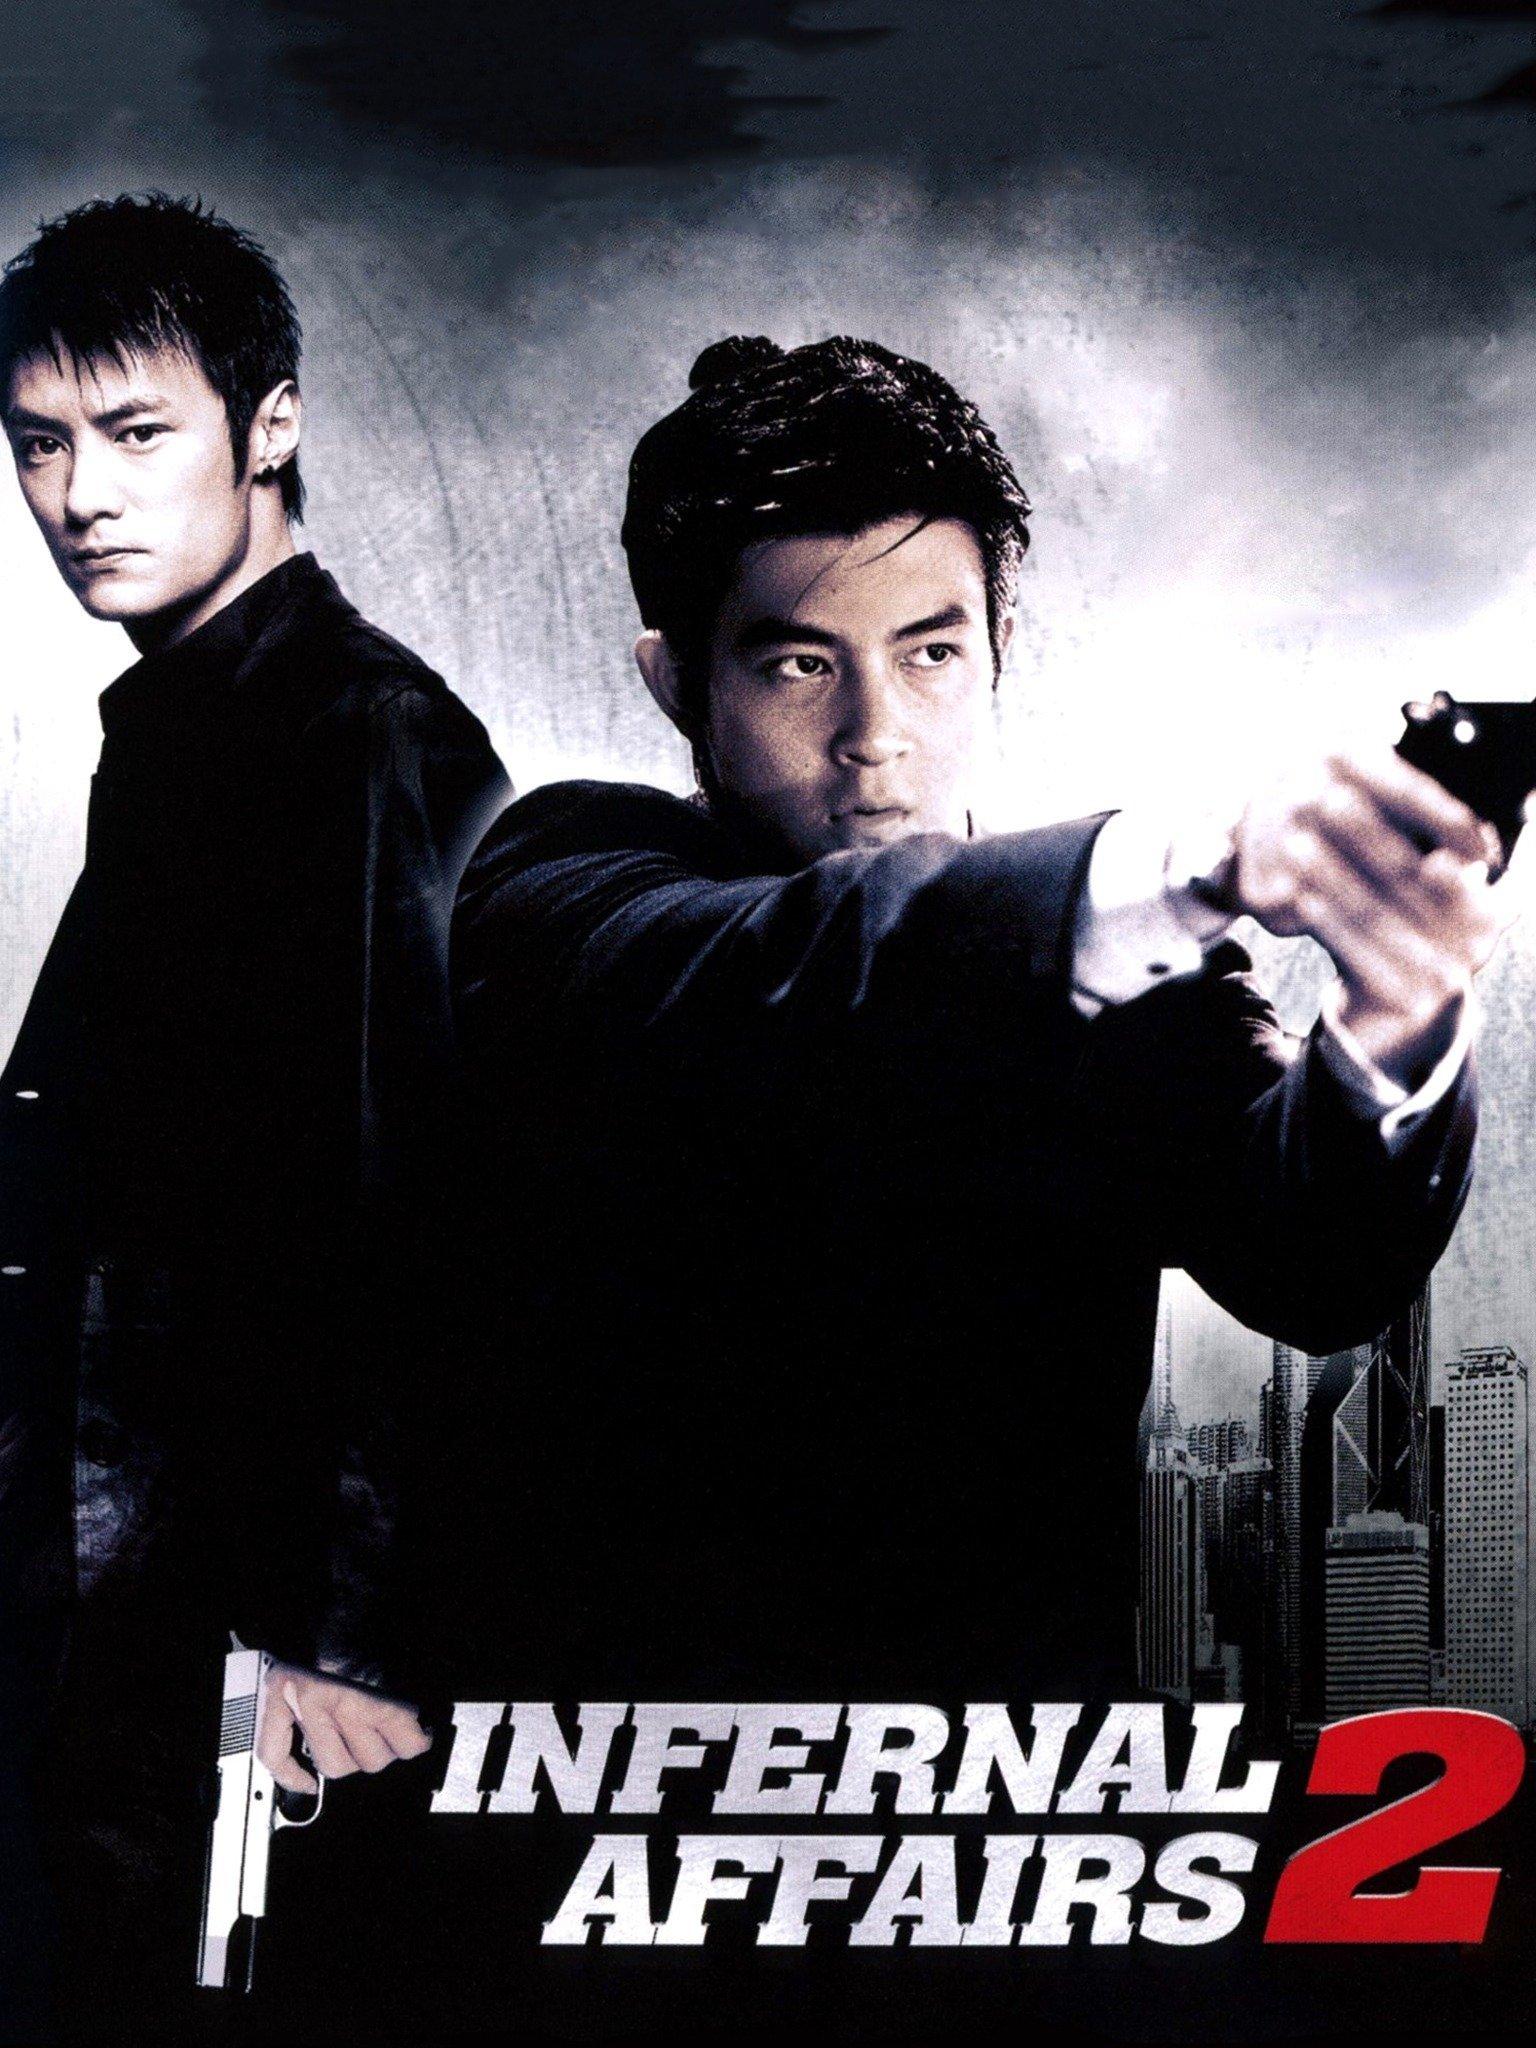 Infernal Affairs II (2003) - Rotten Tomatoes